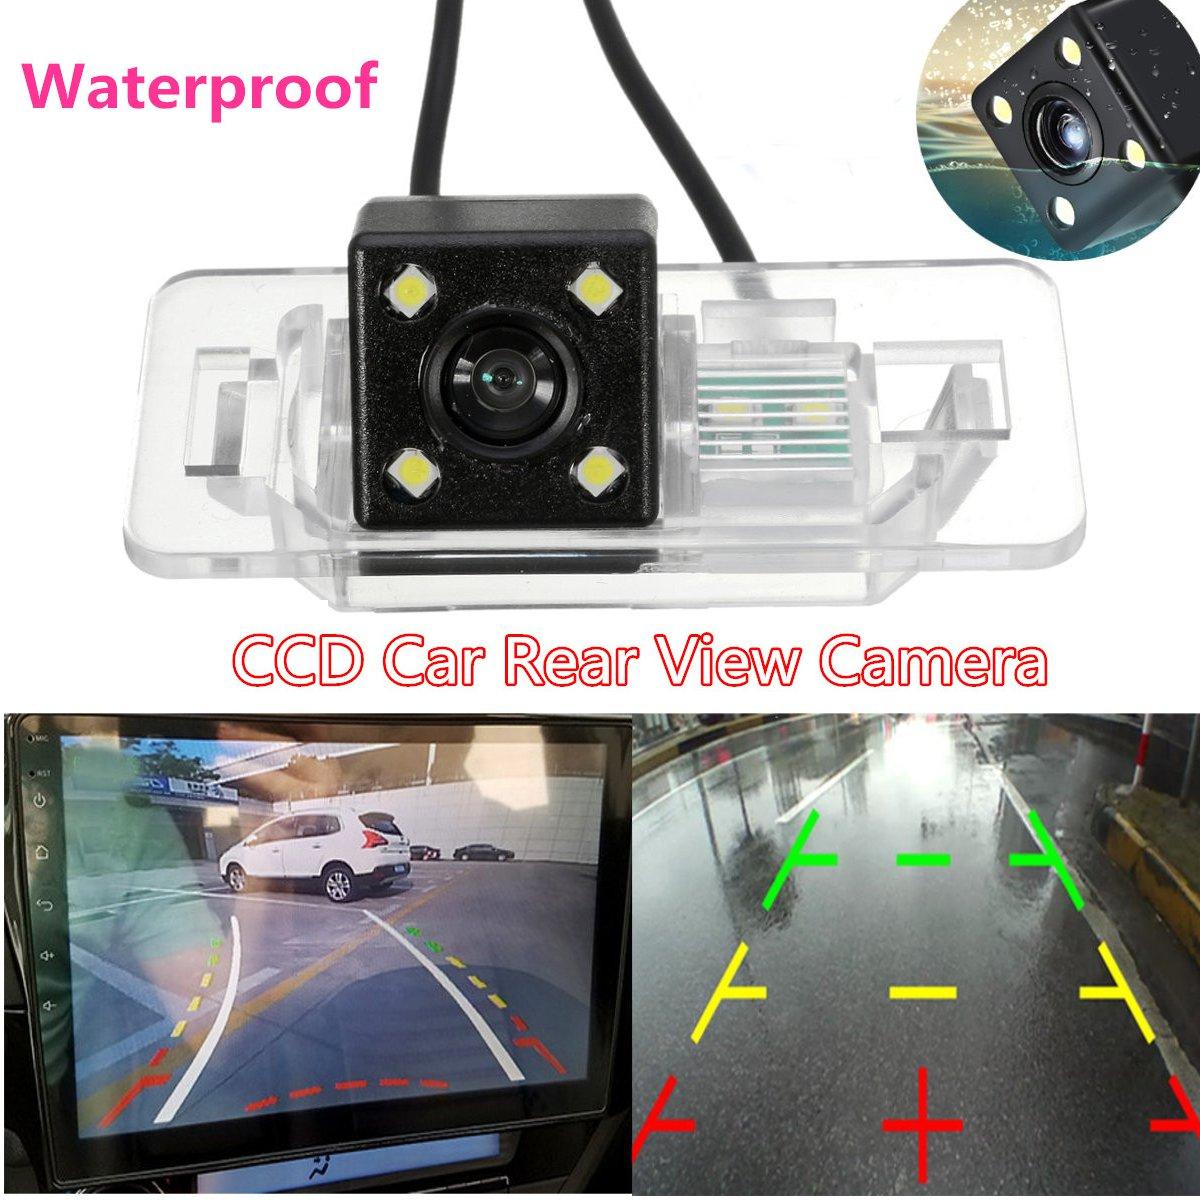 Car CCD Rear View Parking Reverse font b Camera b font For BMW E39 E46 E53